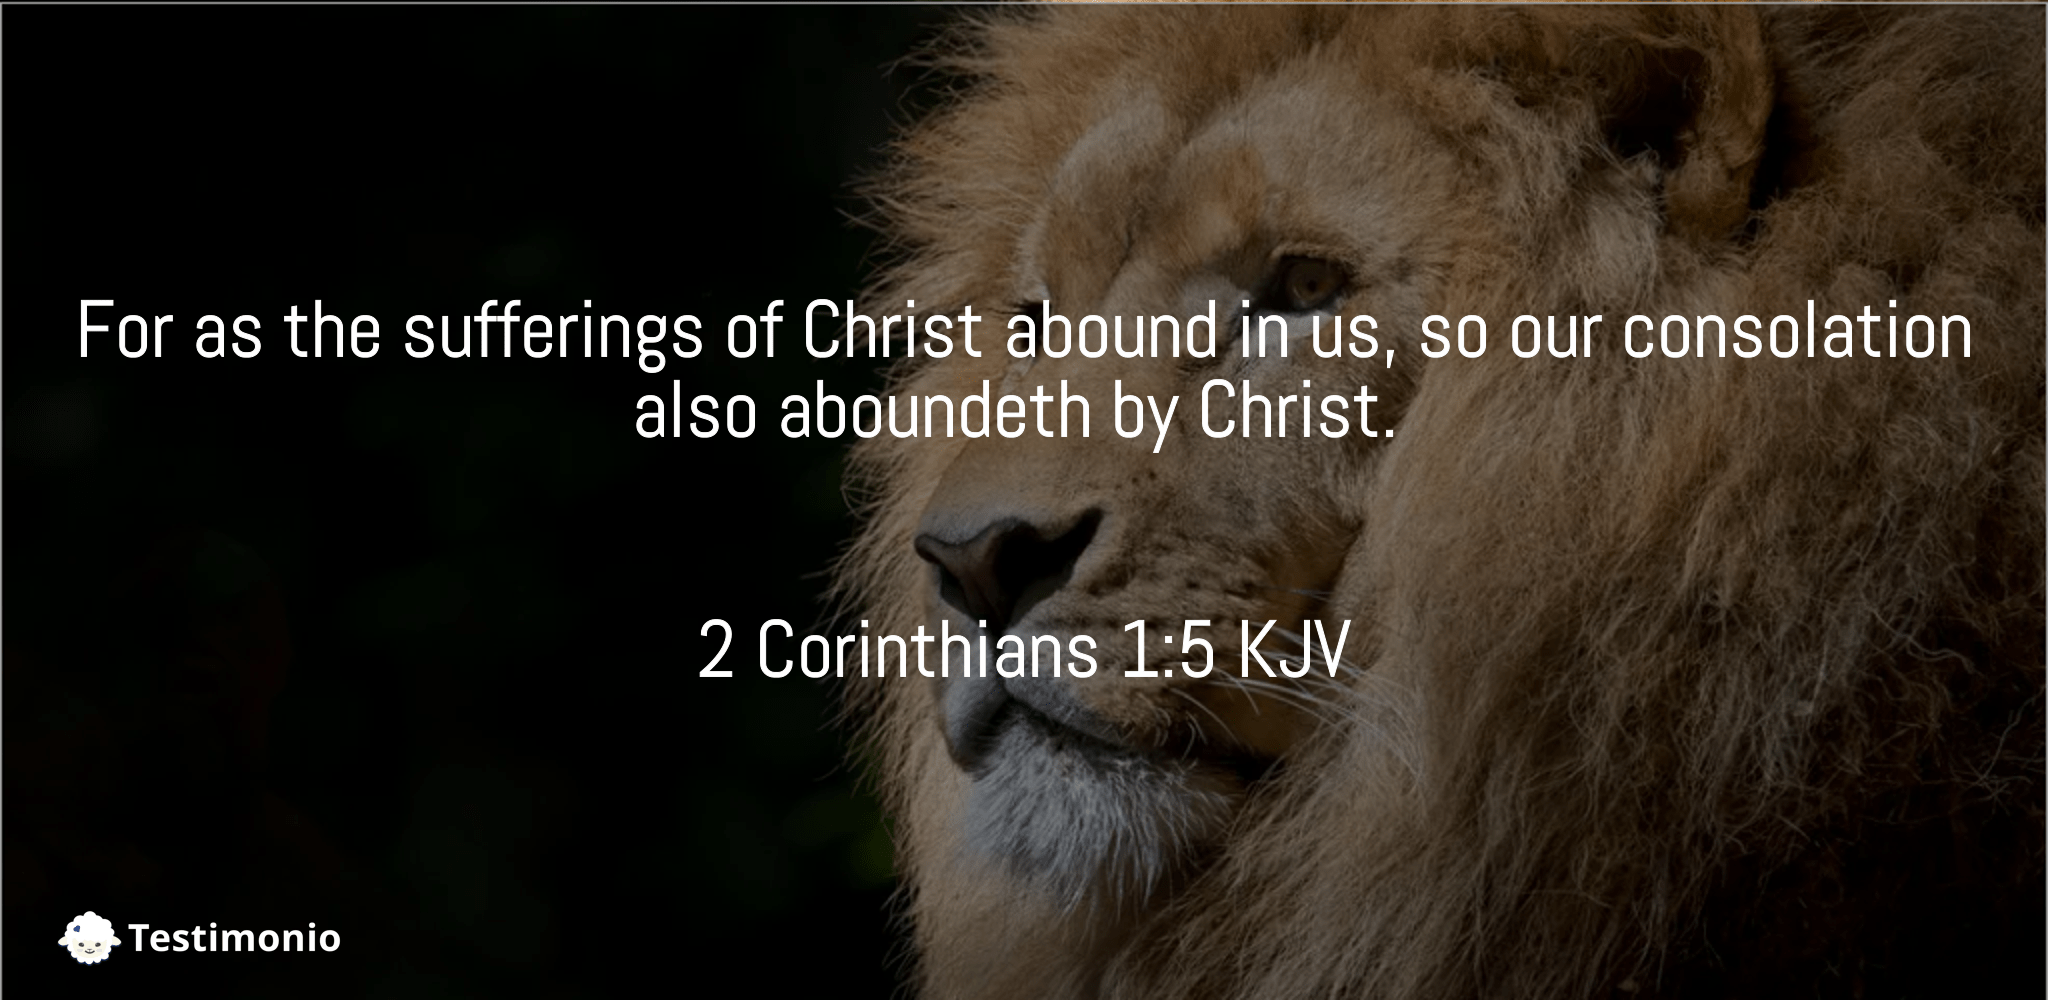 2 Corinthians 1:5